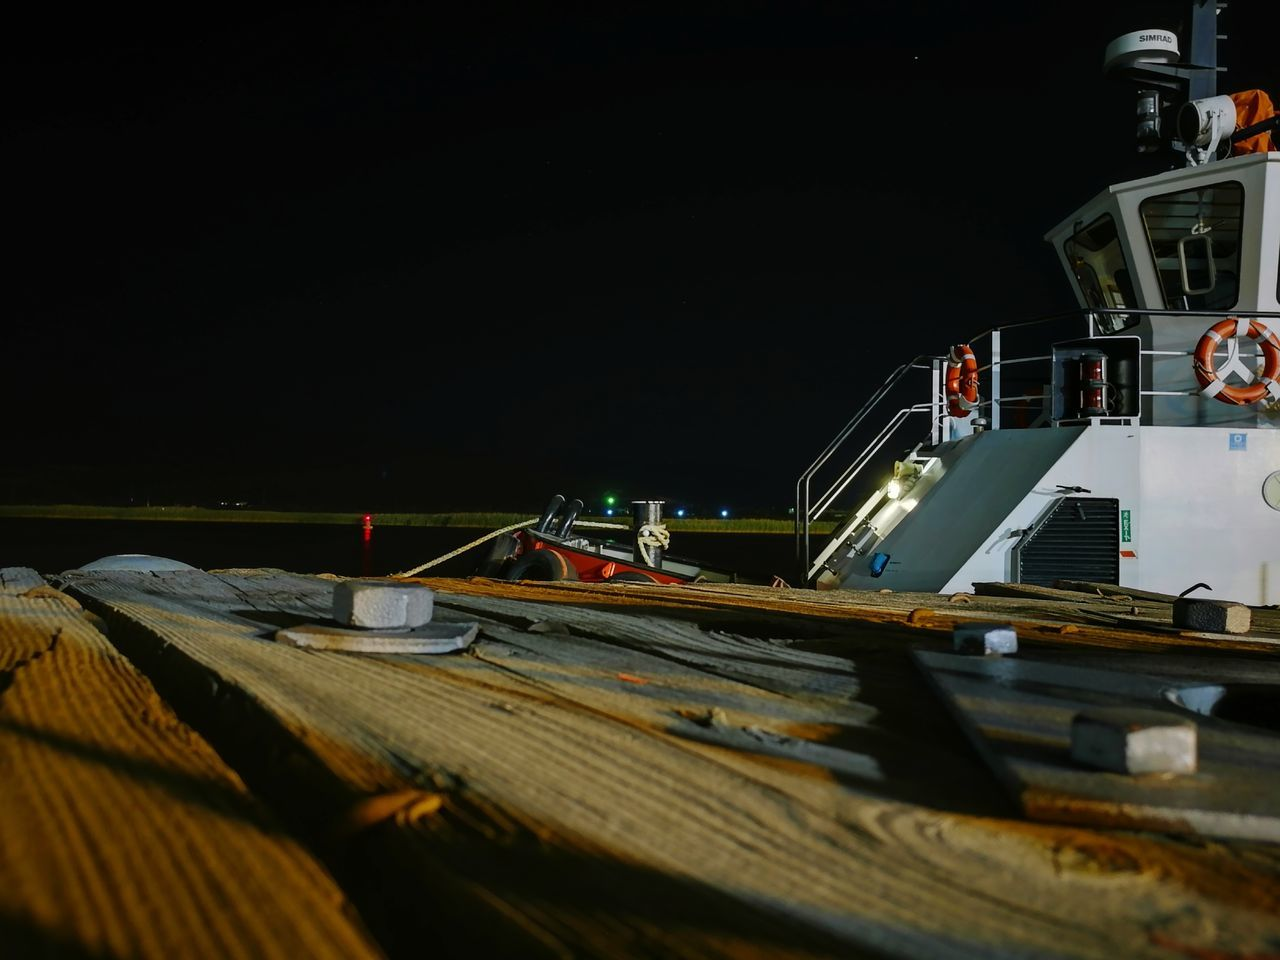 night, no people, illuminated, transportation, outdoors, nautical vessel, city